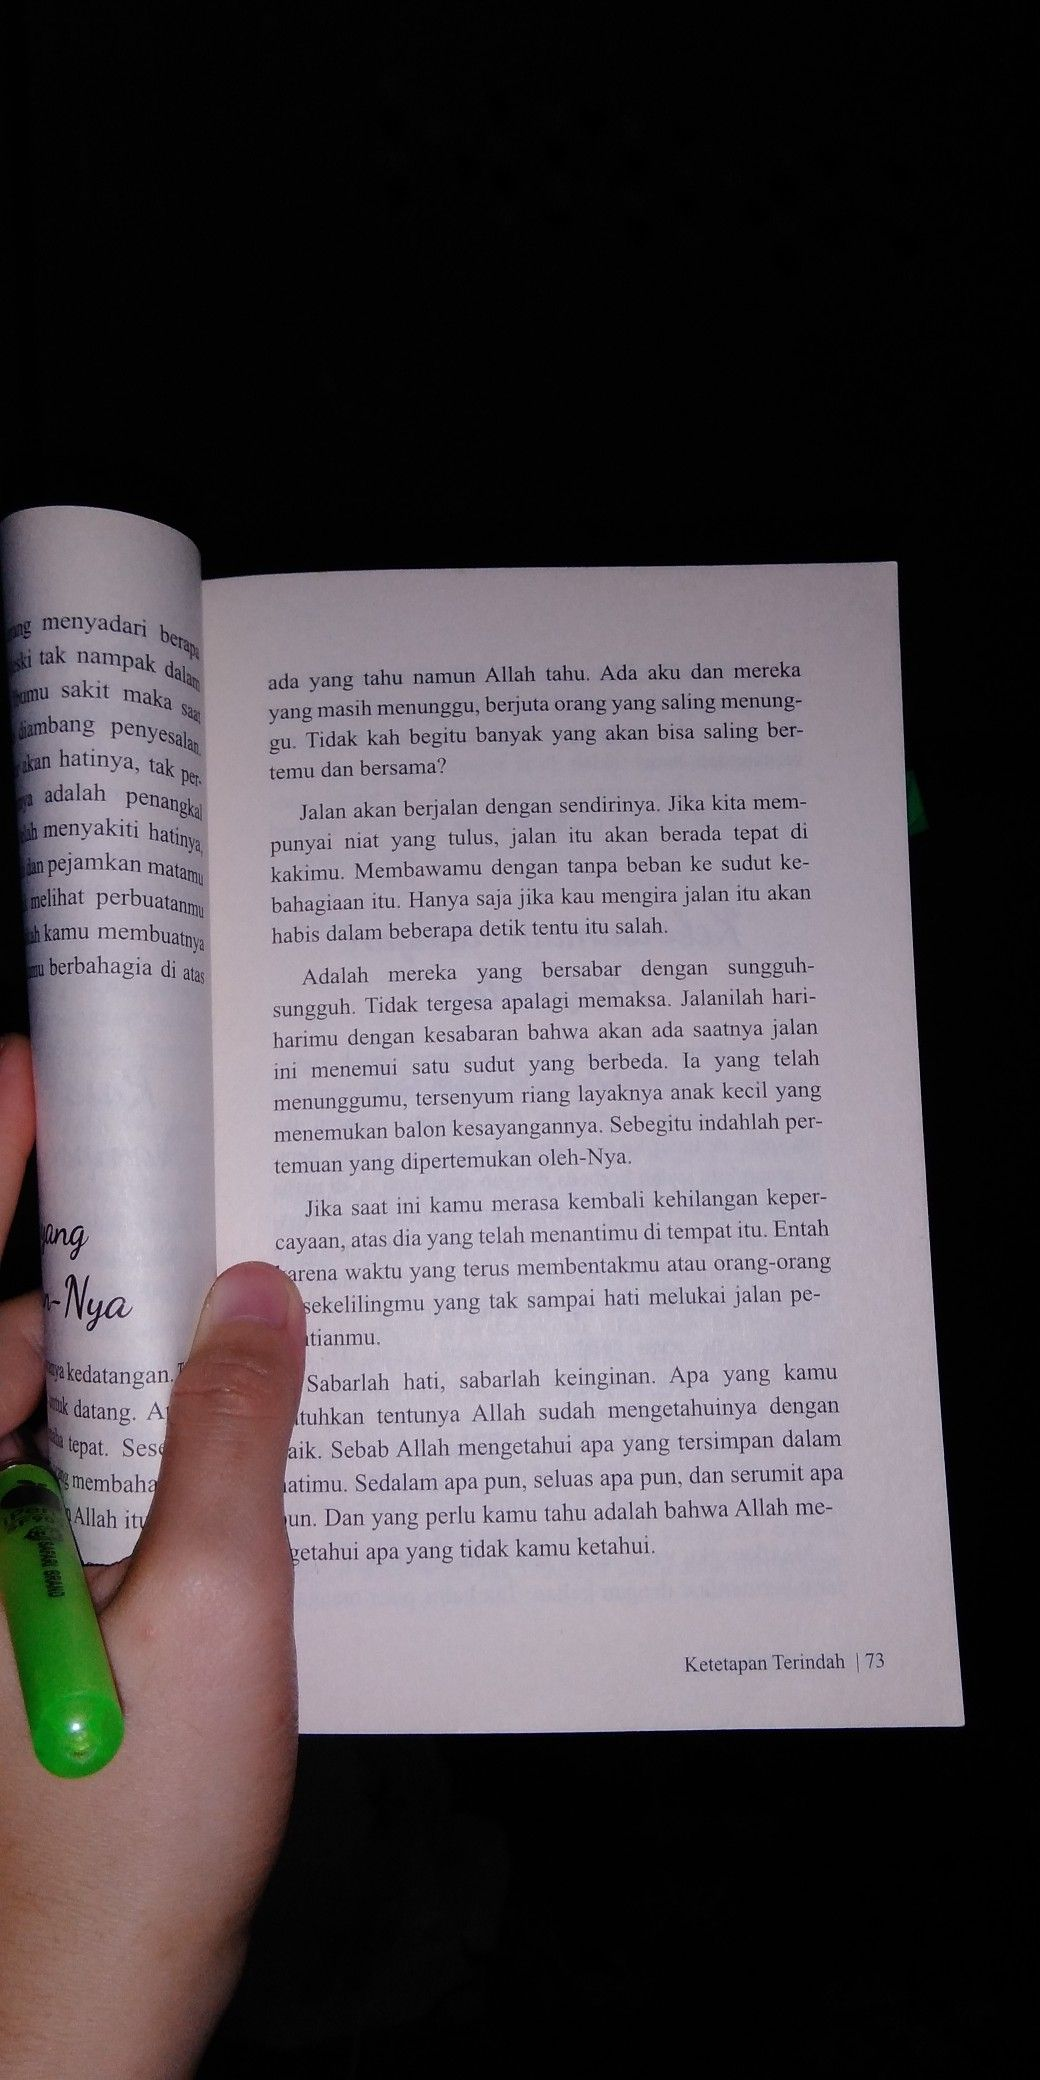 Pin Oleh Antares 30 Di Punya Orang Kutipan Buku Kata Kata Indah Kata Kata